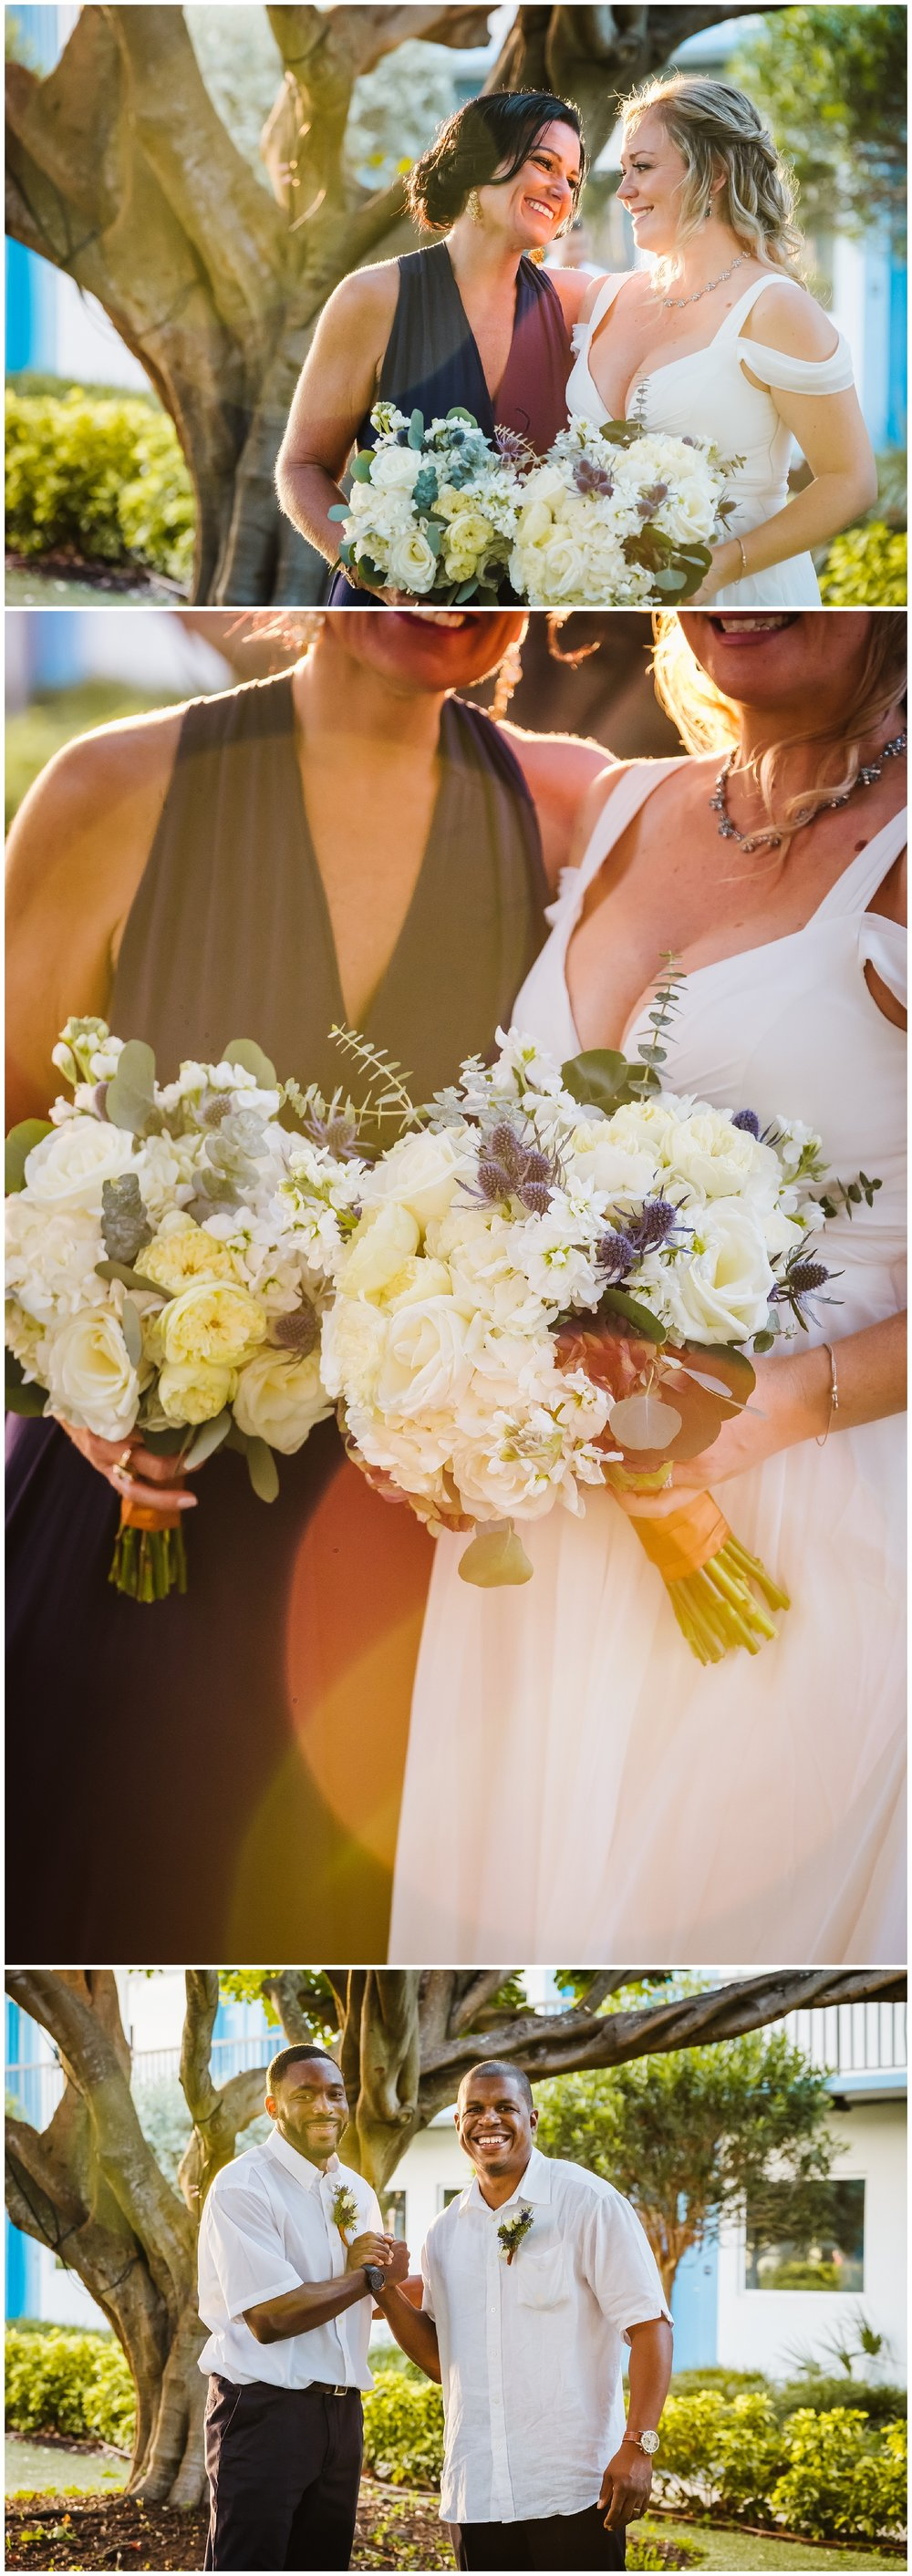 post-card-inn-wedding-photographer-twins-beach-bubbles_0020.jpg